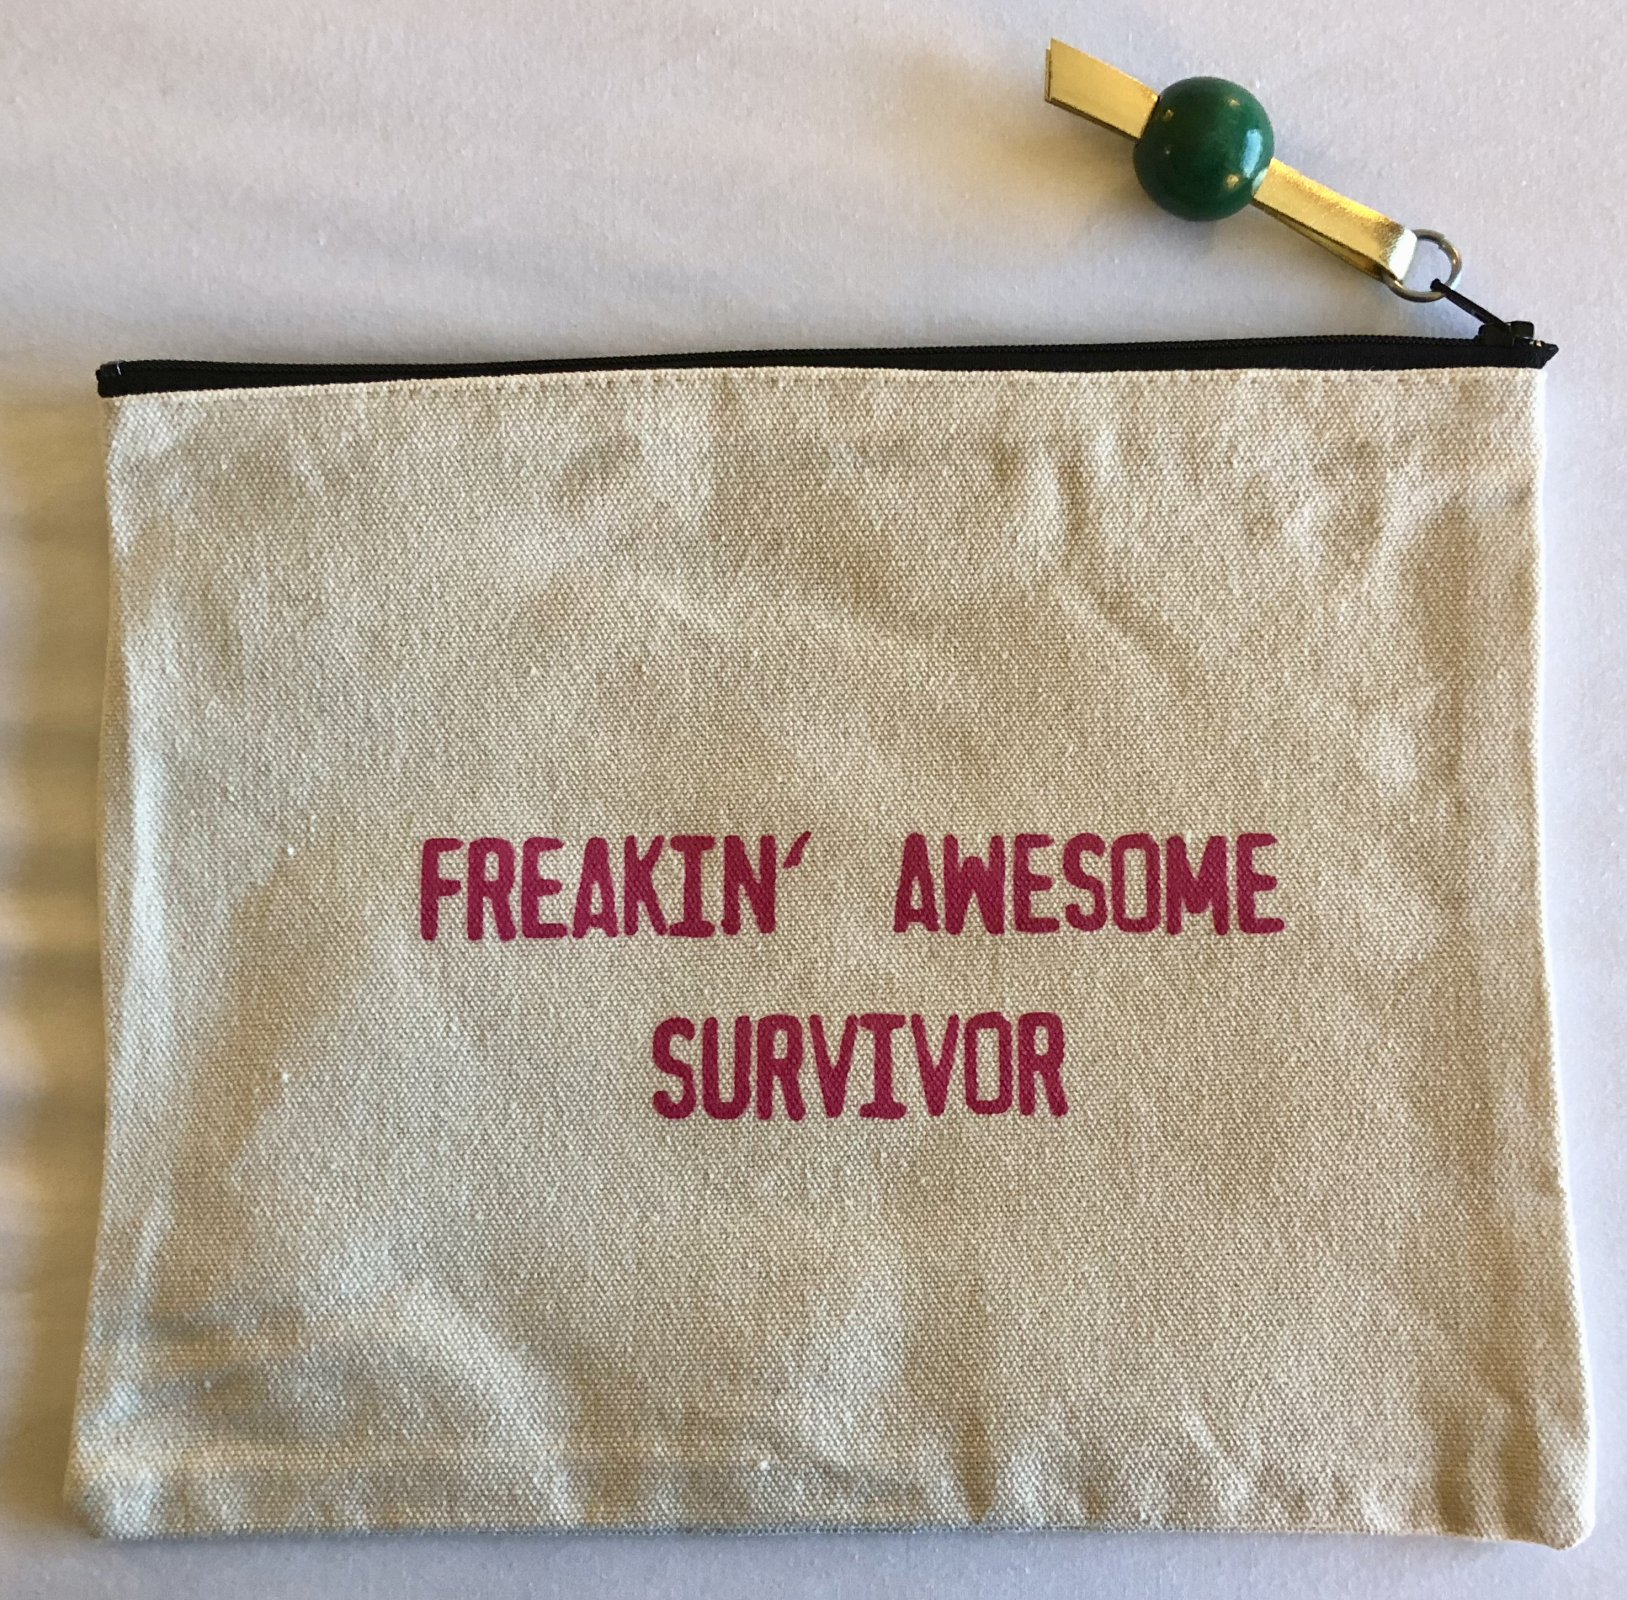 freakin' awesome survivor